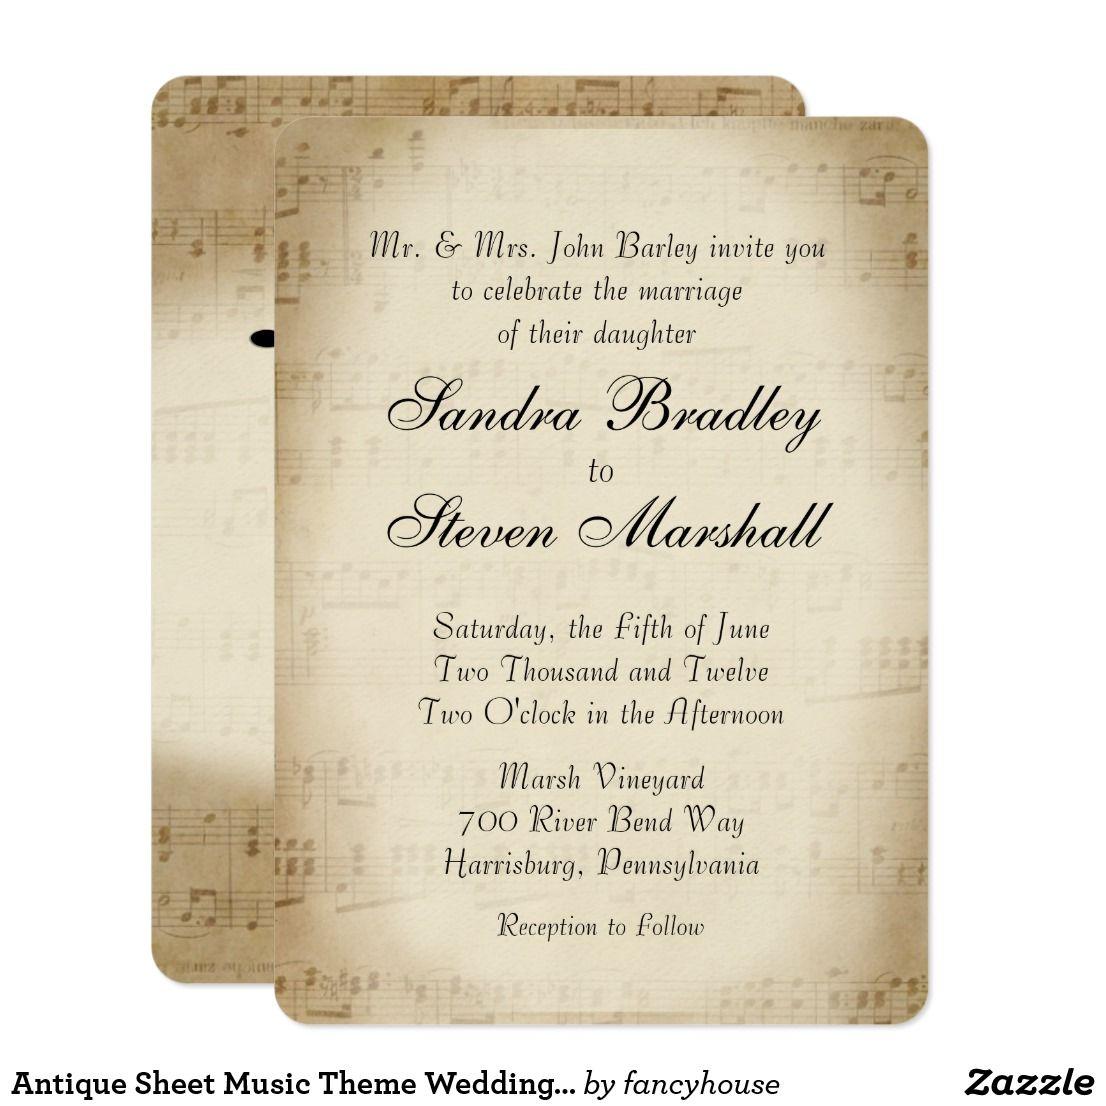 Antique Sheet Music Theme Wedding Invitation | Music theme weddings ...